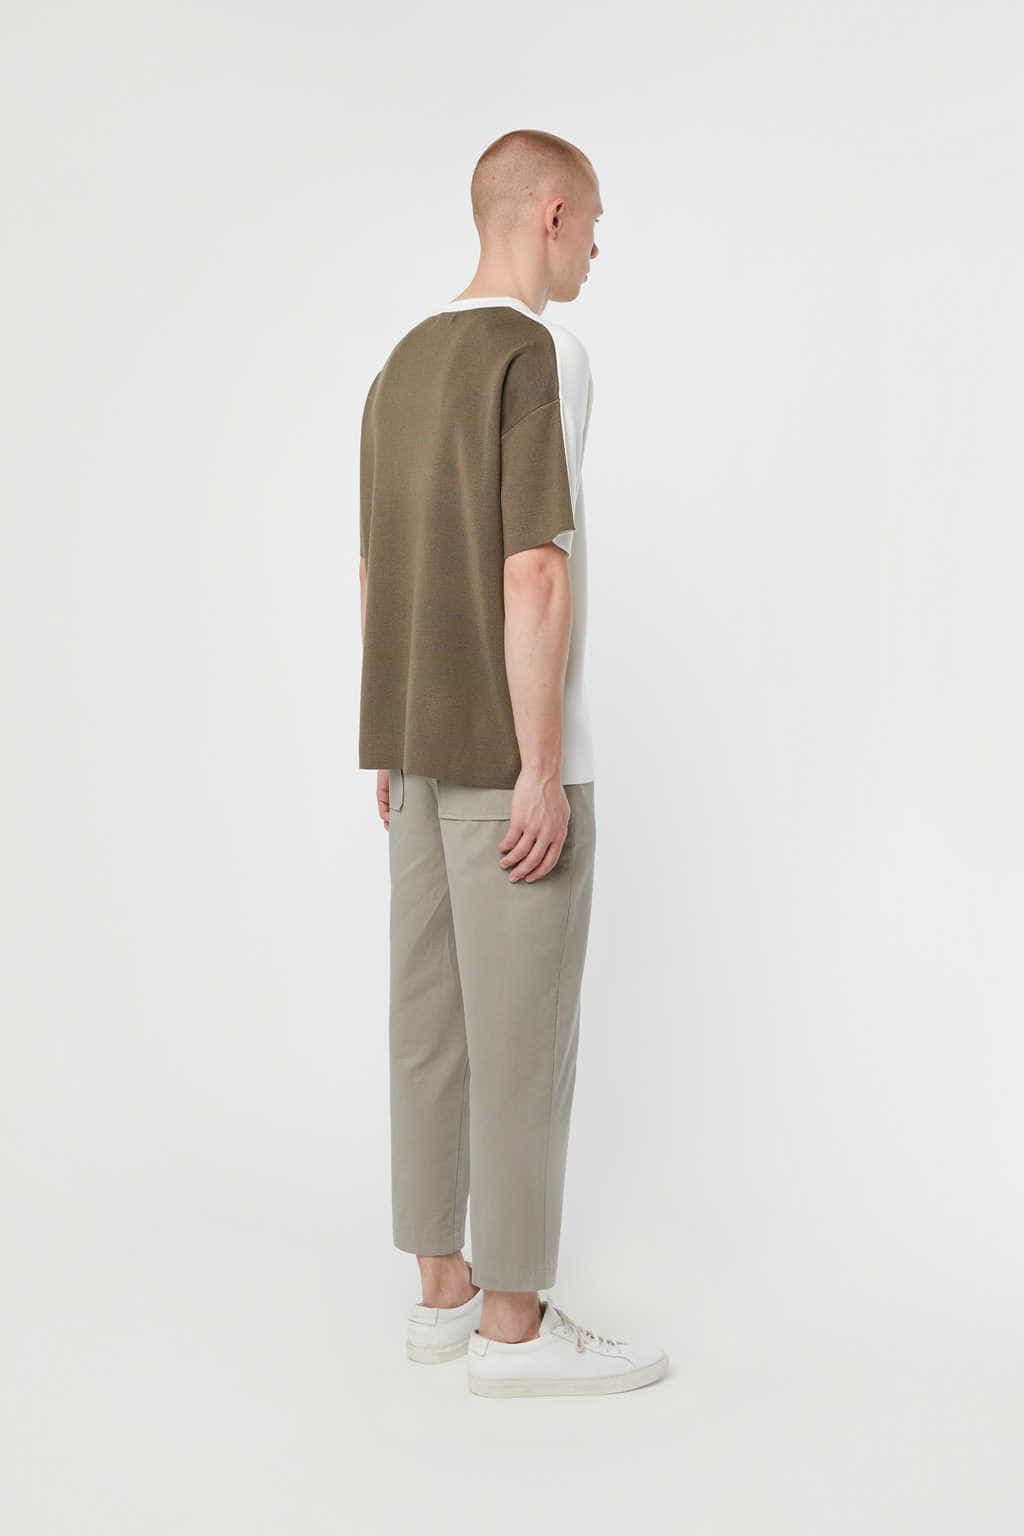 Sweater 3156 Cream 4